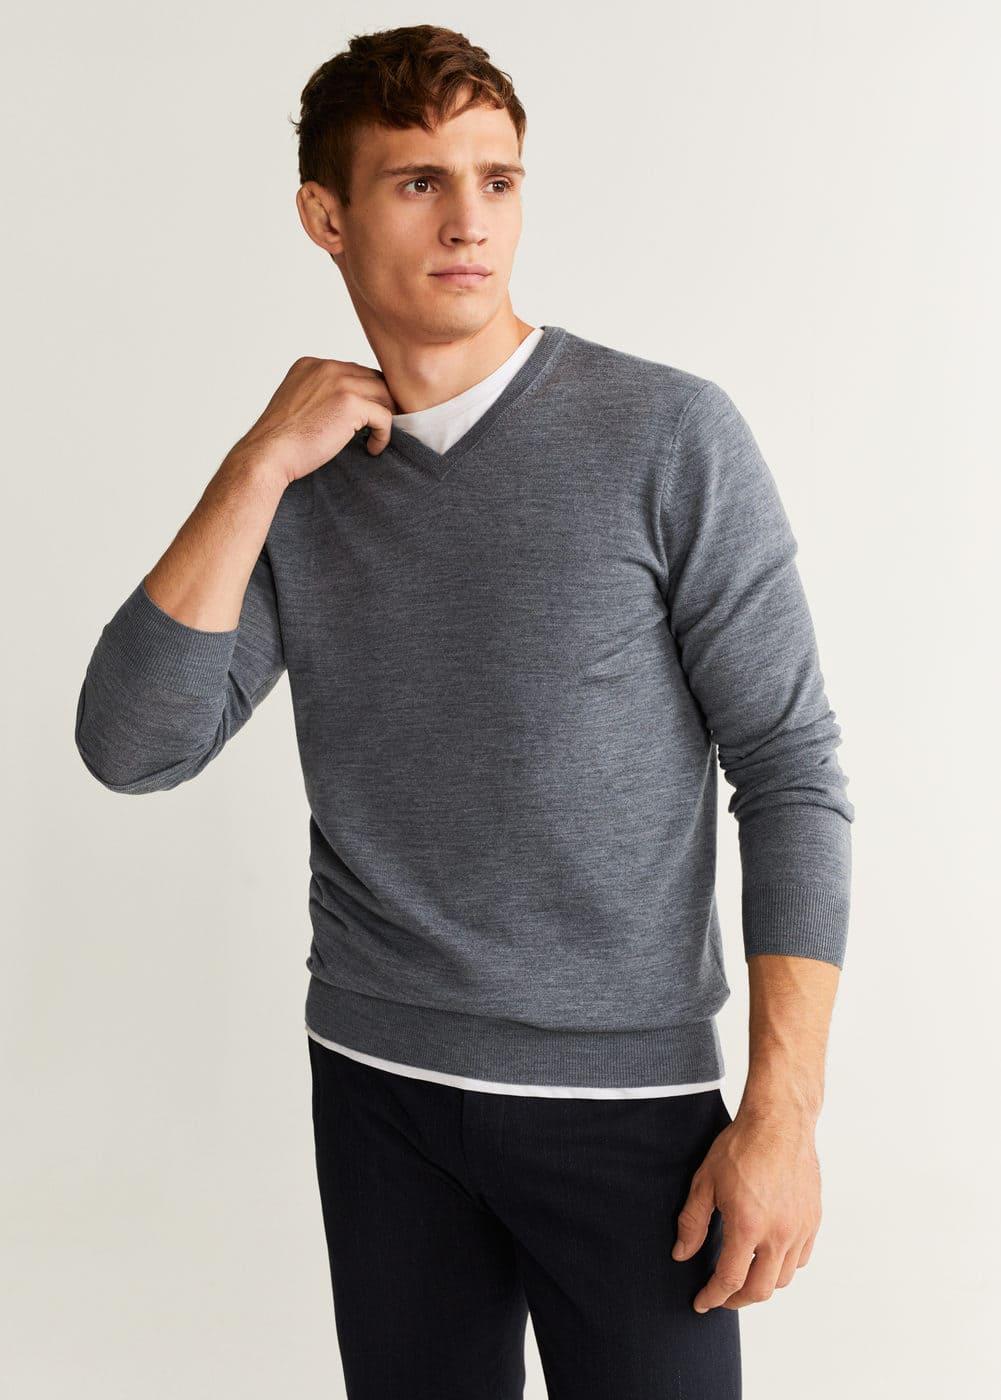 100% Merino Wool Washable Sweater by Mango